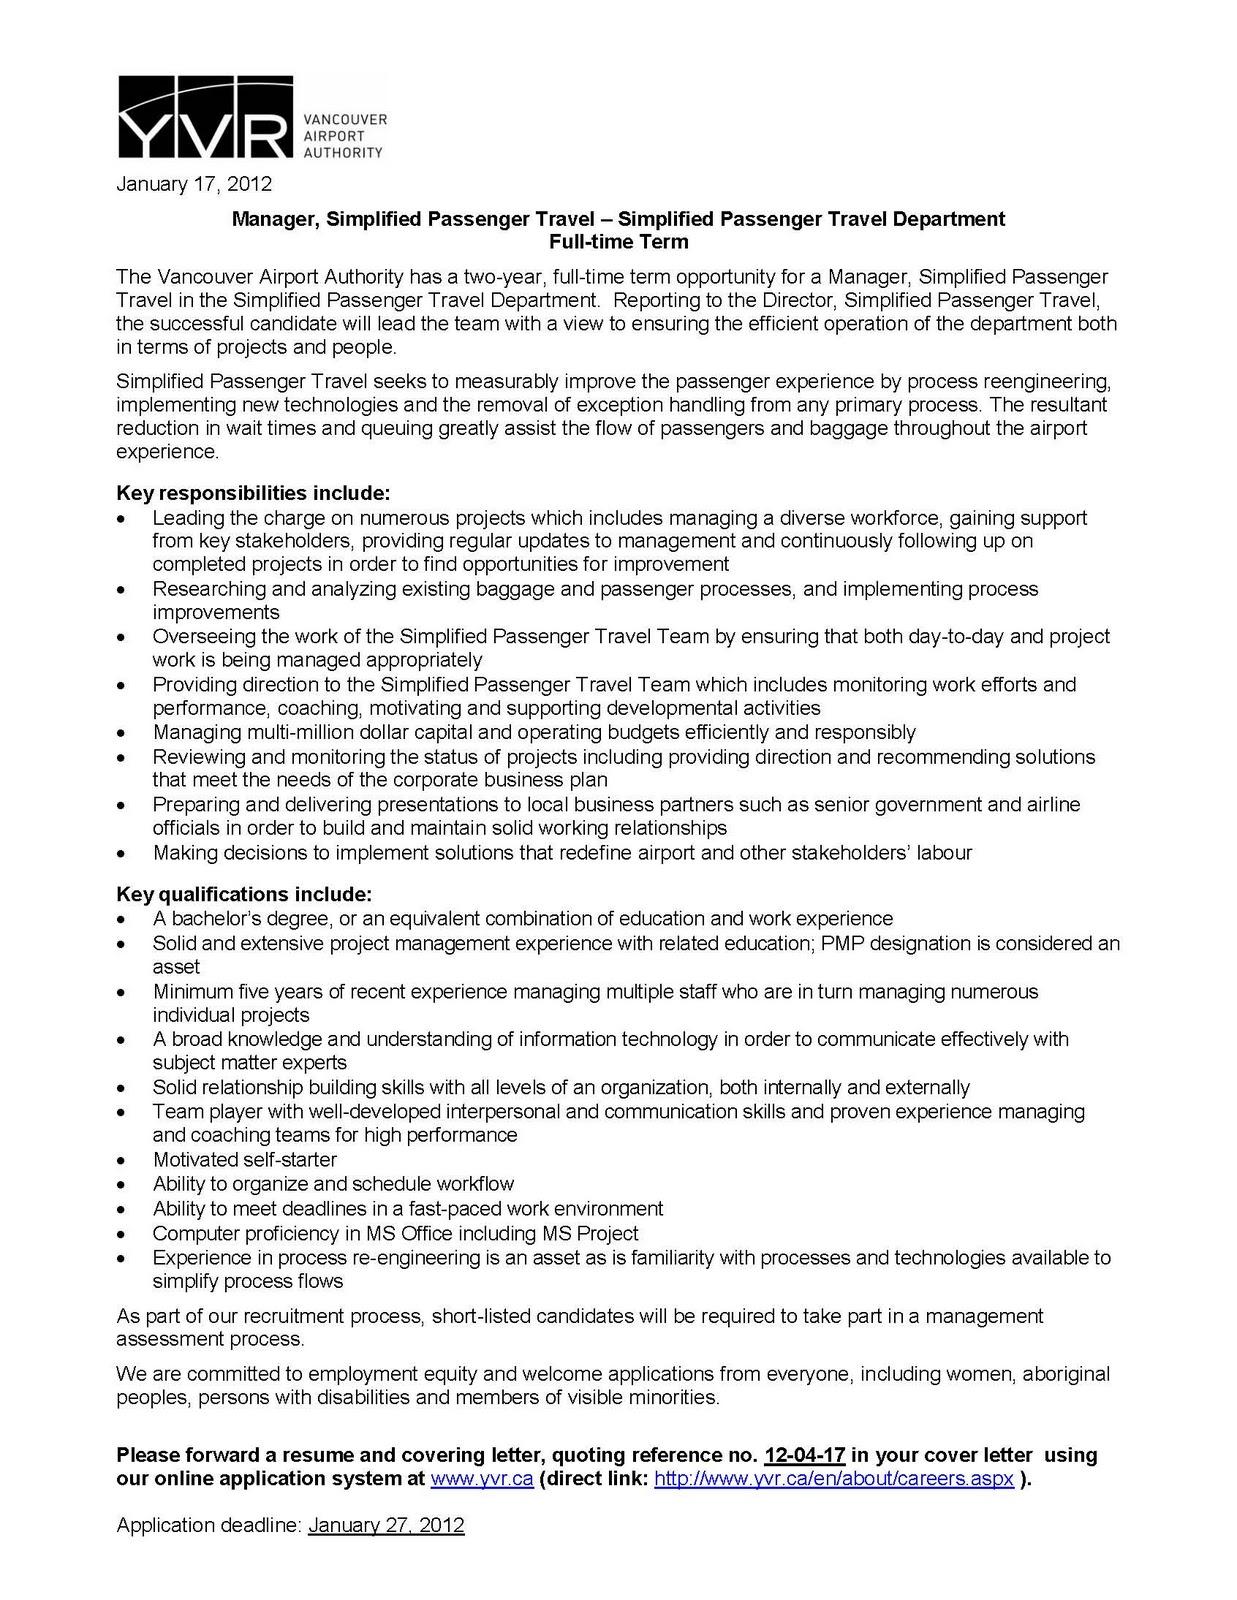 Ground staff resume - careerplus.web.fc2.com